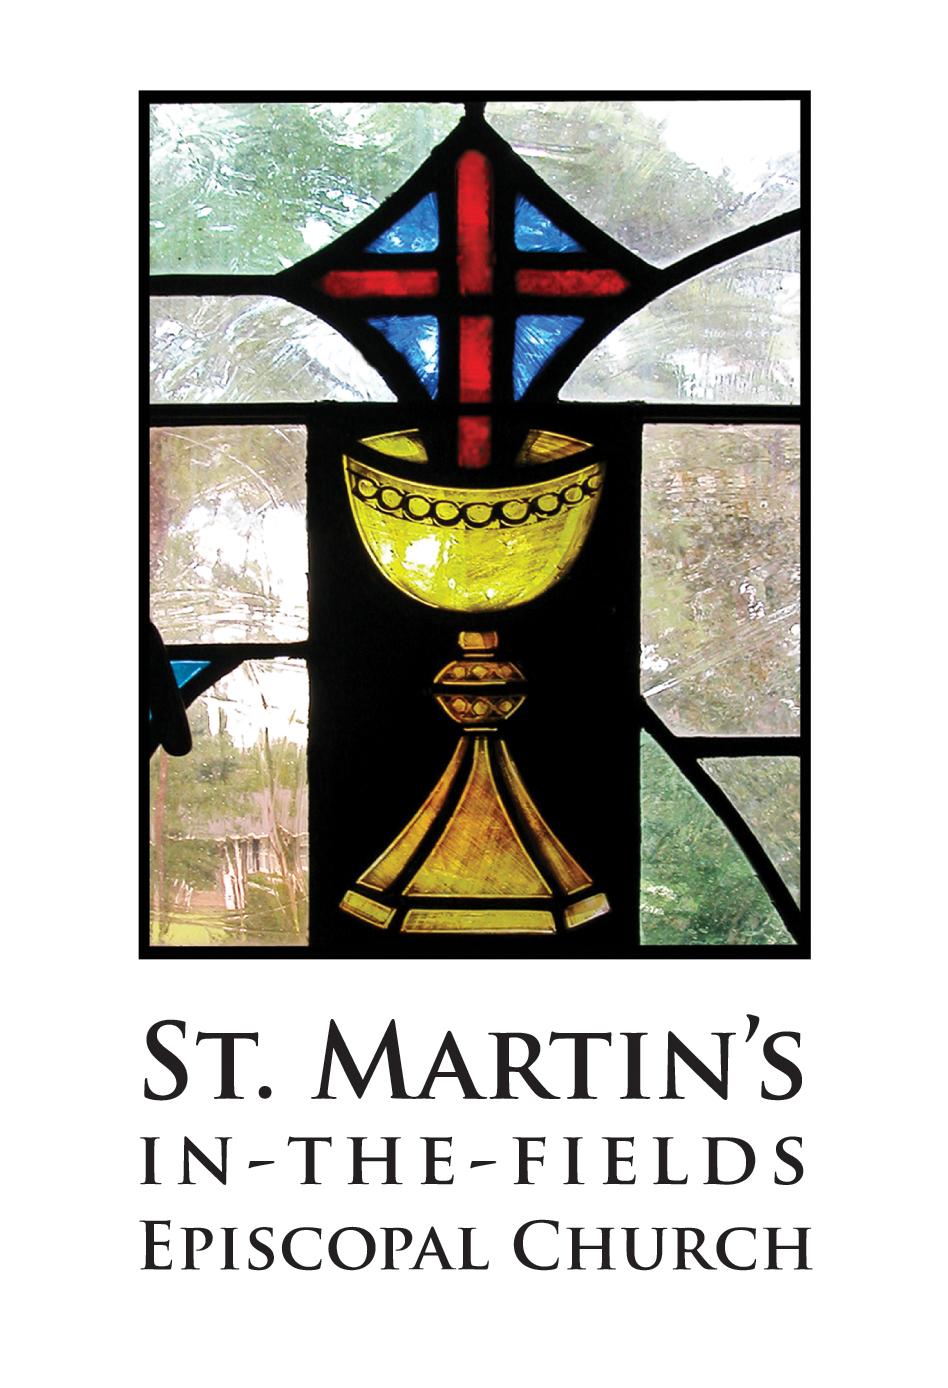 St. Martin's Sermons